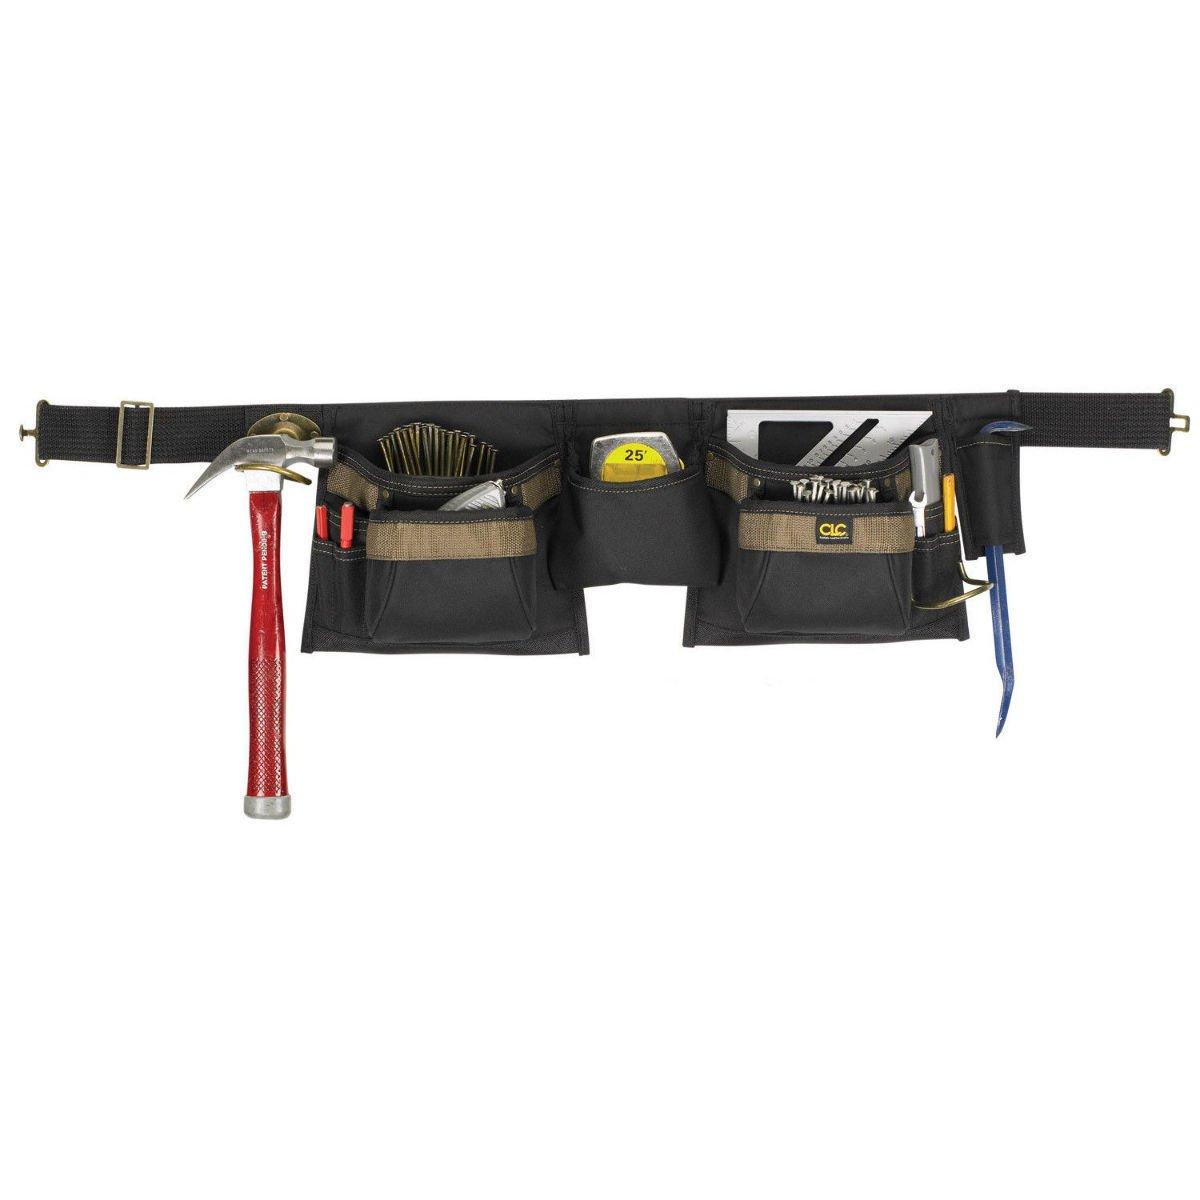 Clc Custom Leathercraft 1429 - 12 Pocket Black Carpenter`s Work Apron Tool Belt